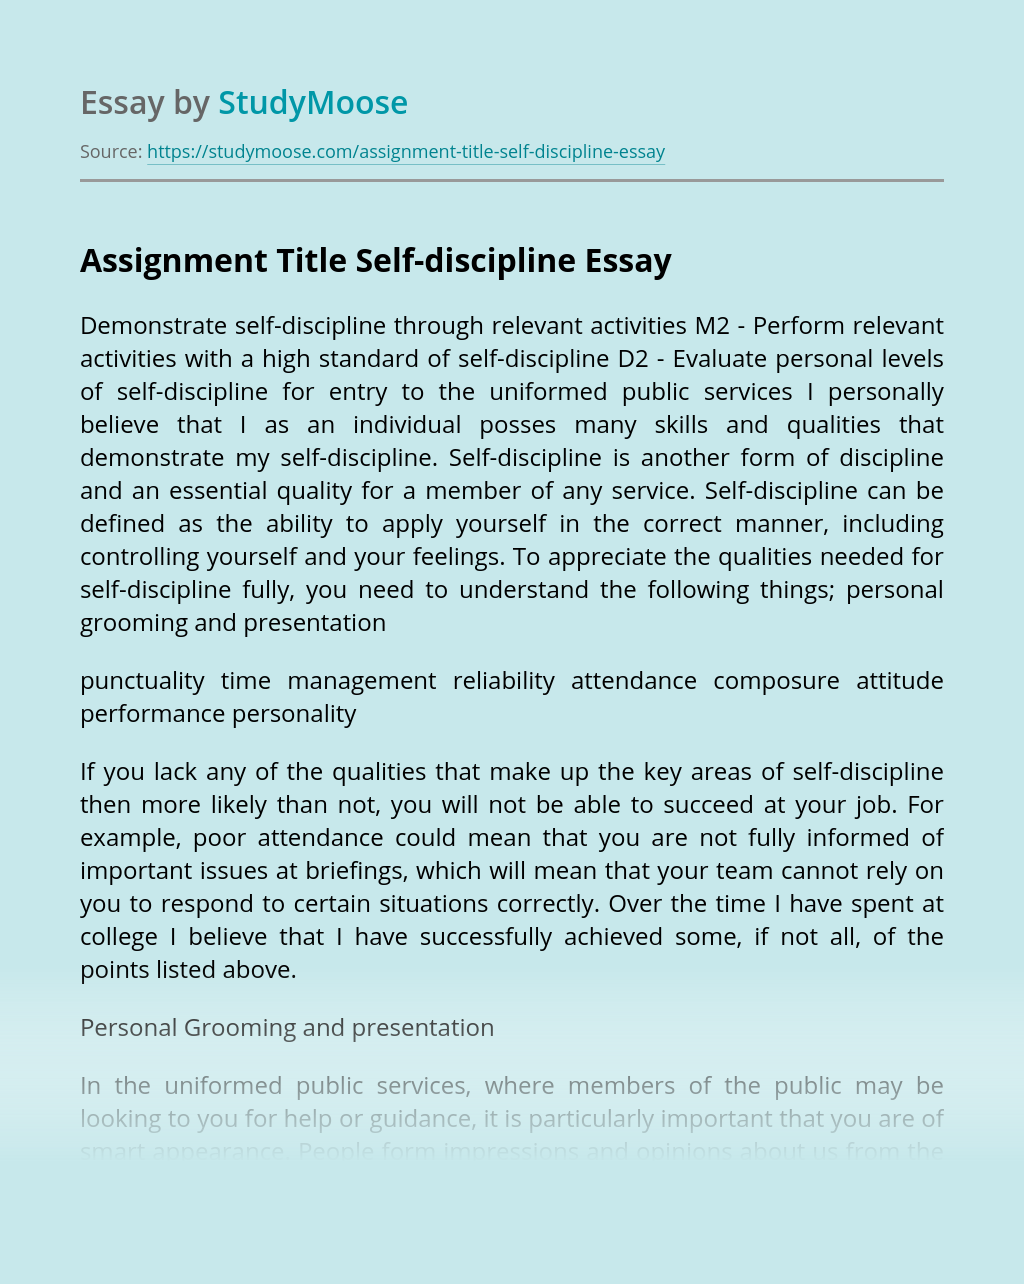 Assignment Title Self-discipline